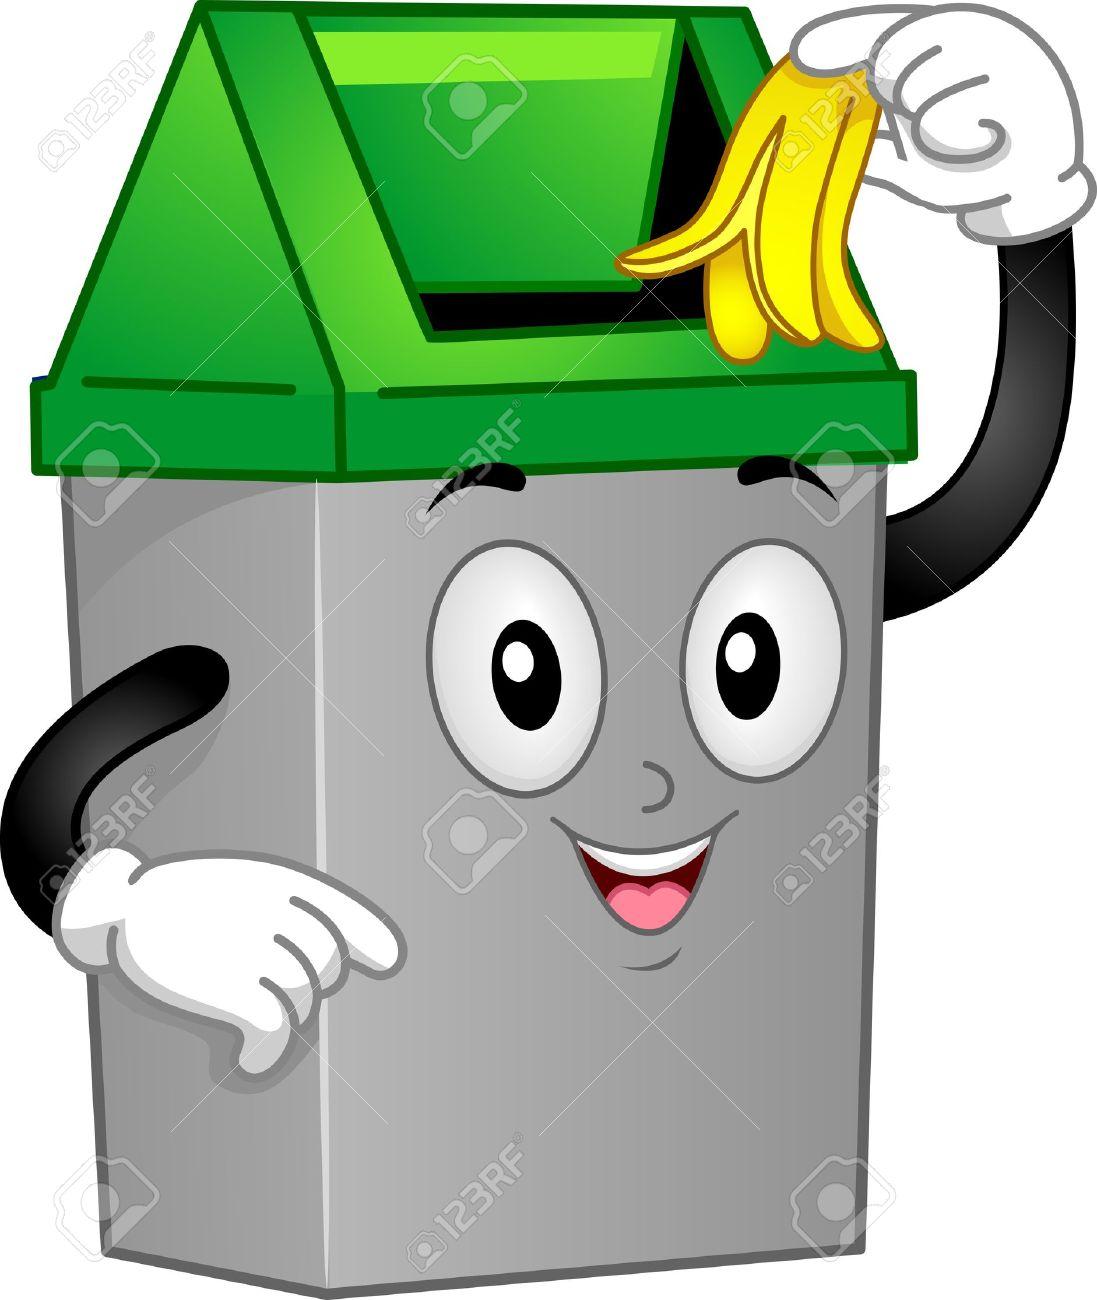 Mascot Illustration Featuring A Trash Can Discarding A Banana.